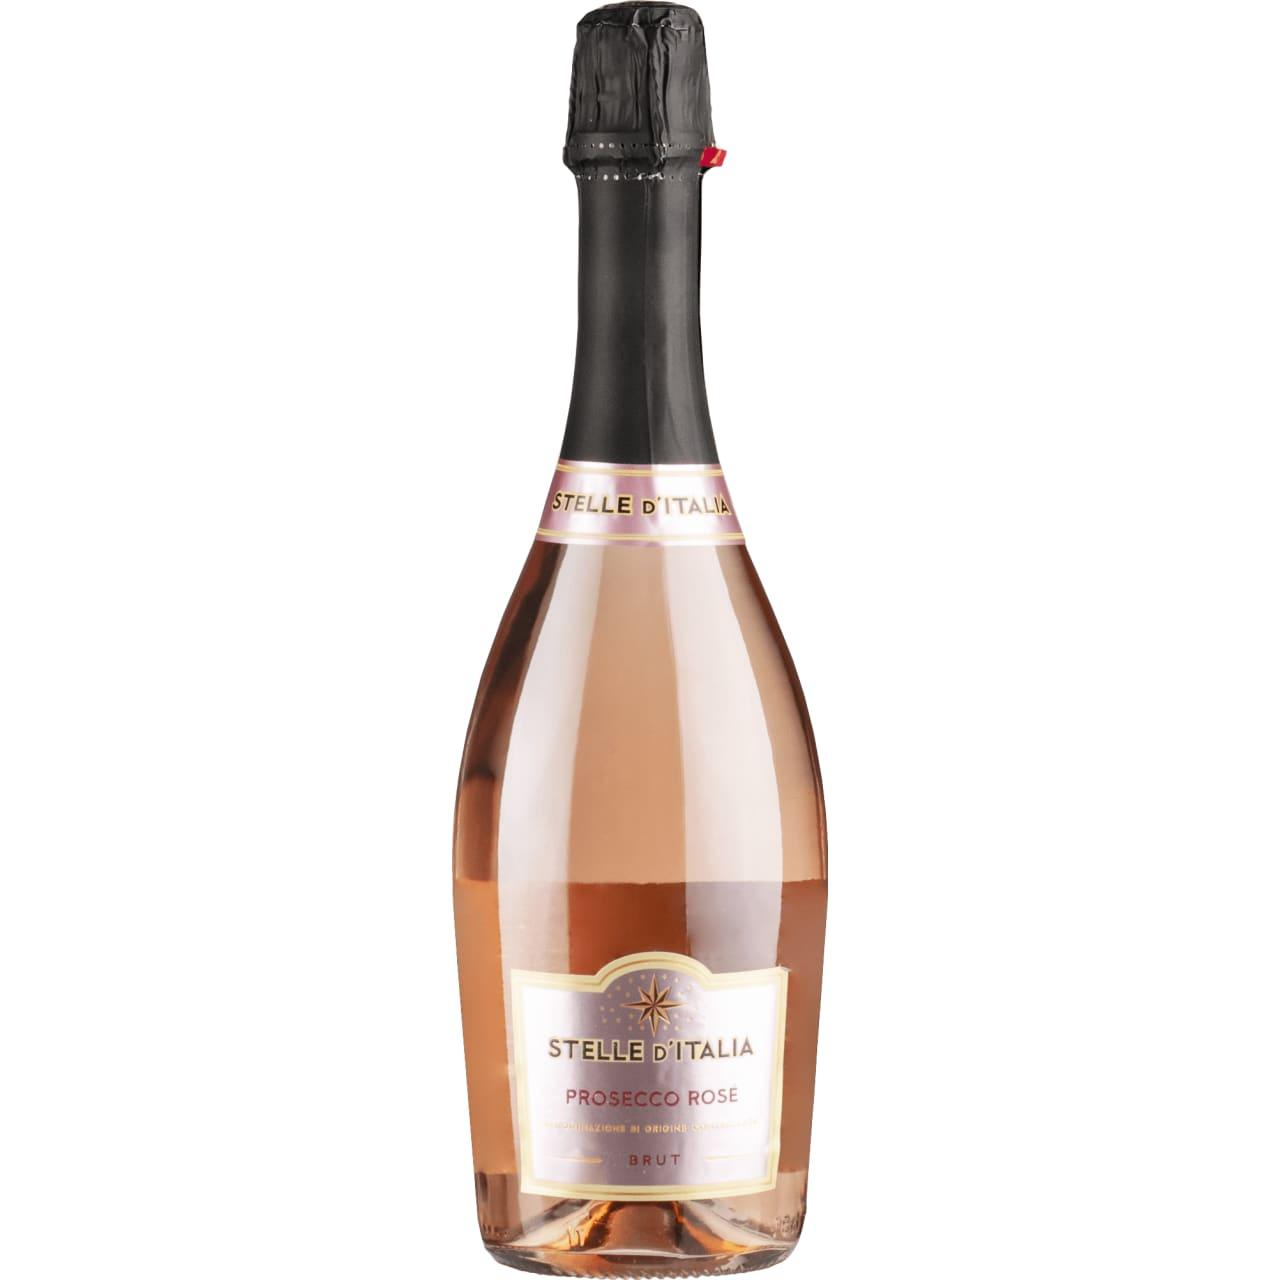 Product Image - Prosecco Rosé DOC, Millesimato Brut 2019, Stelle d'Italia